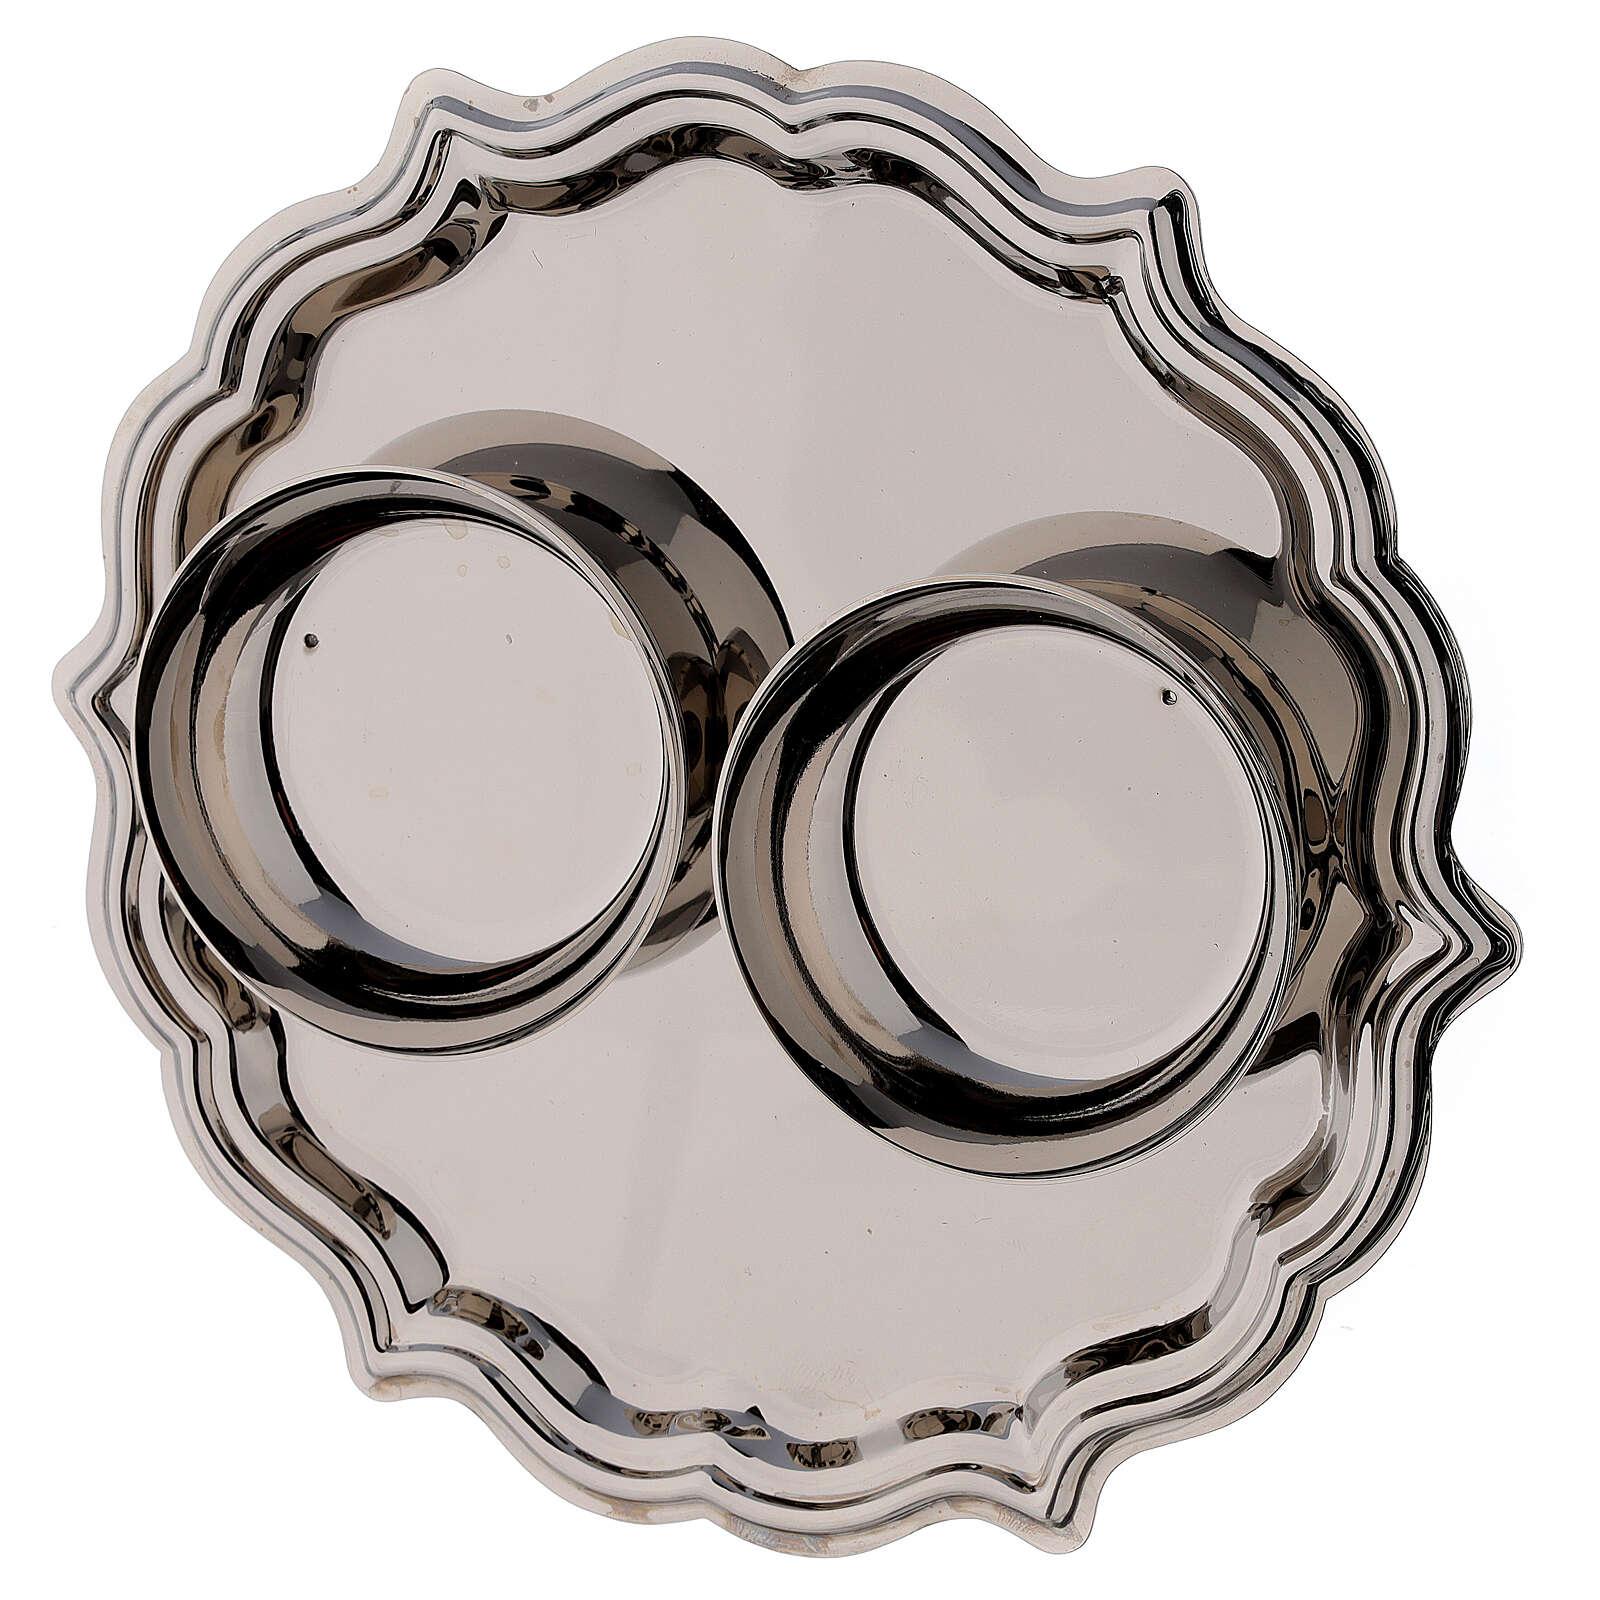 Palermo cruet set in silver plated brass 75 ml 4